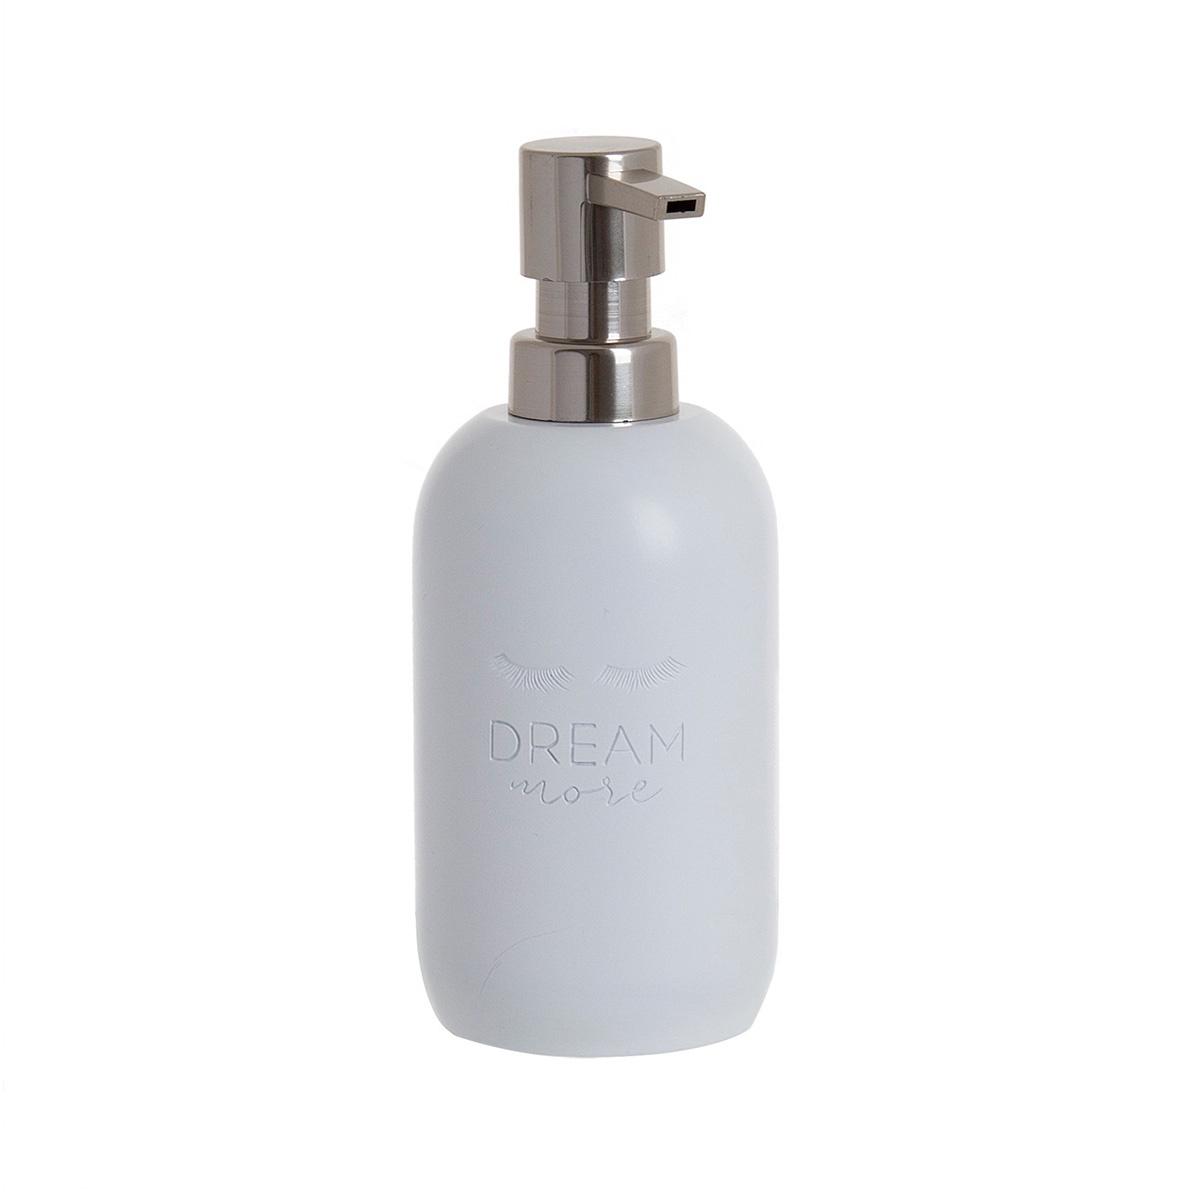 Диспенсер для мыла D'casa Chic, 350 мл, белый кружка d casa chic цвет белый 350 мл